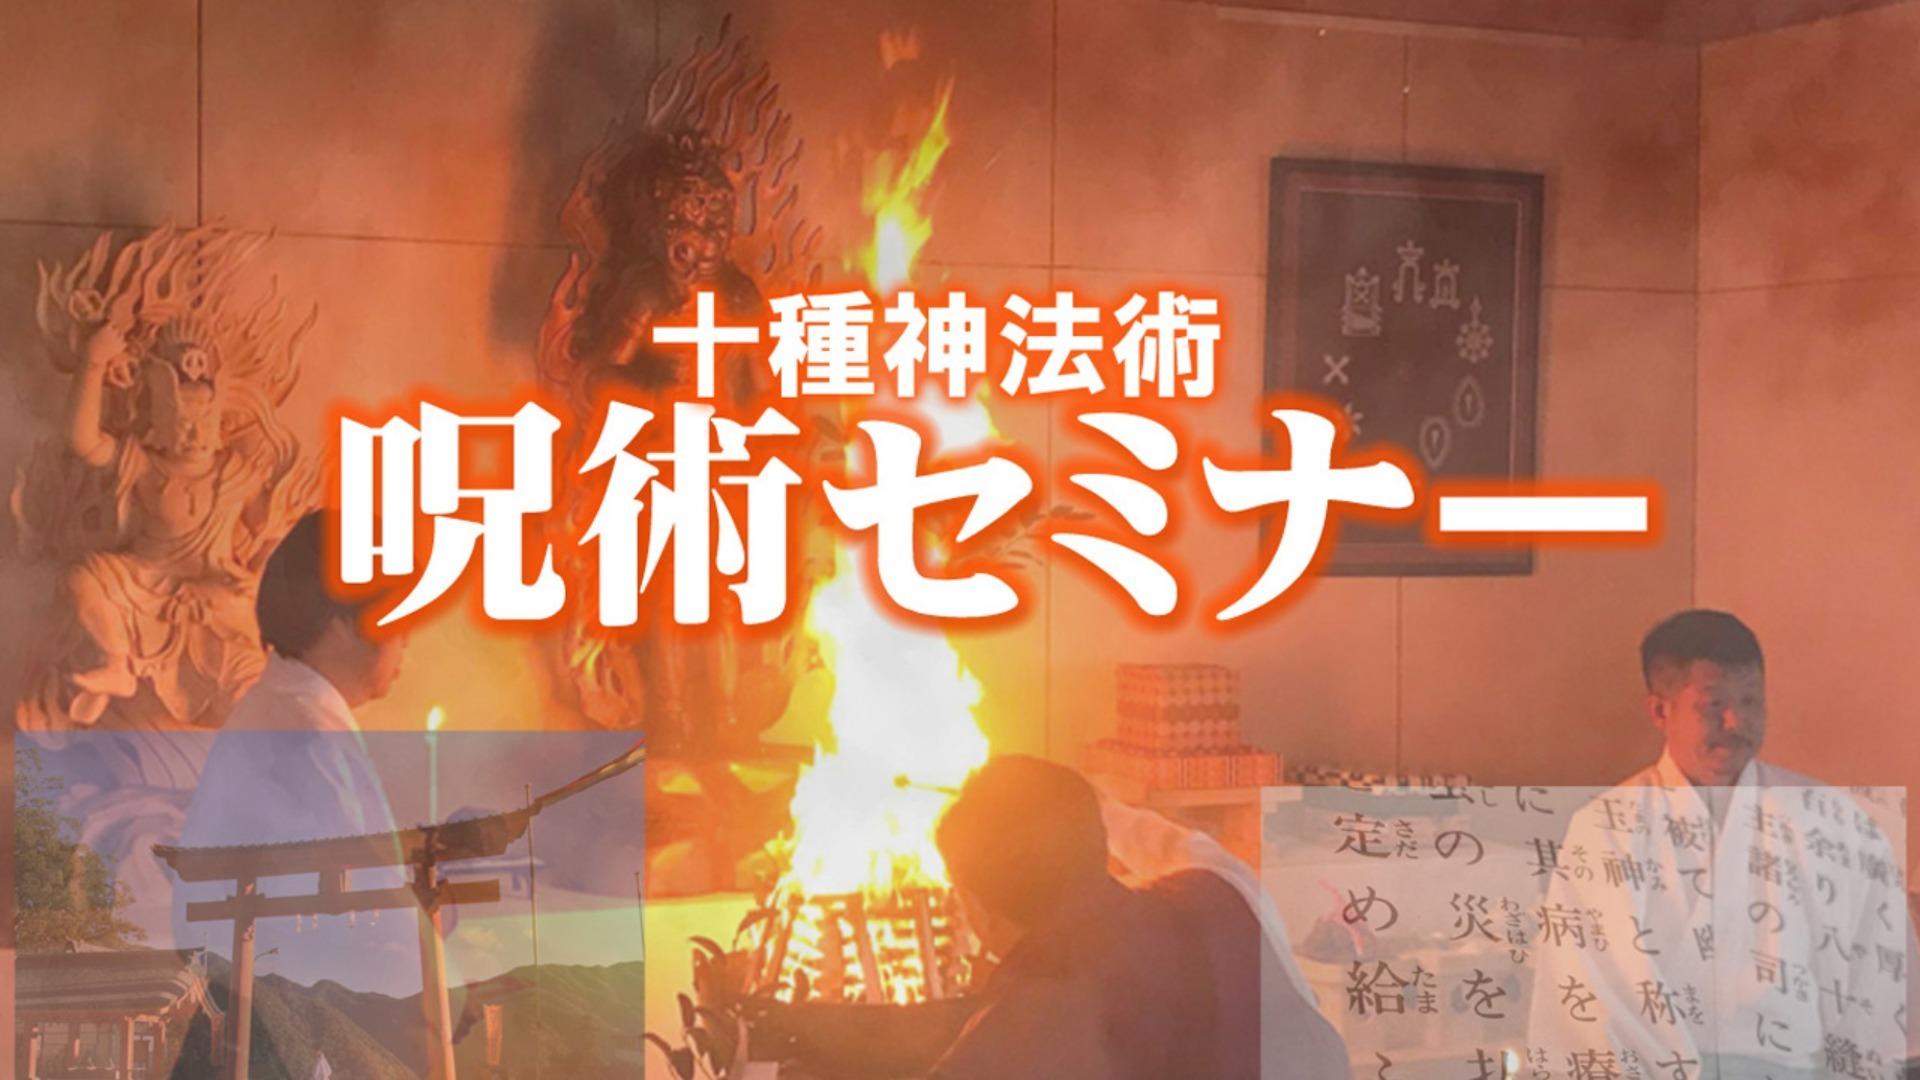 21.4.20《5月13日(木)、29日(土)呪術セミナー開催!》